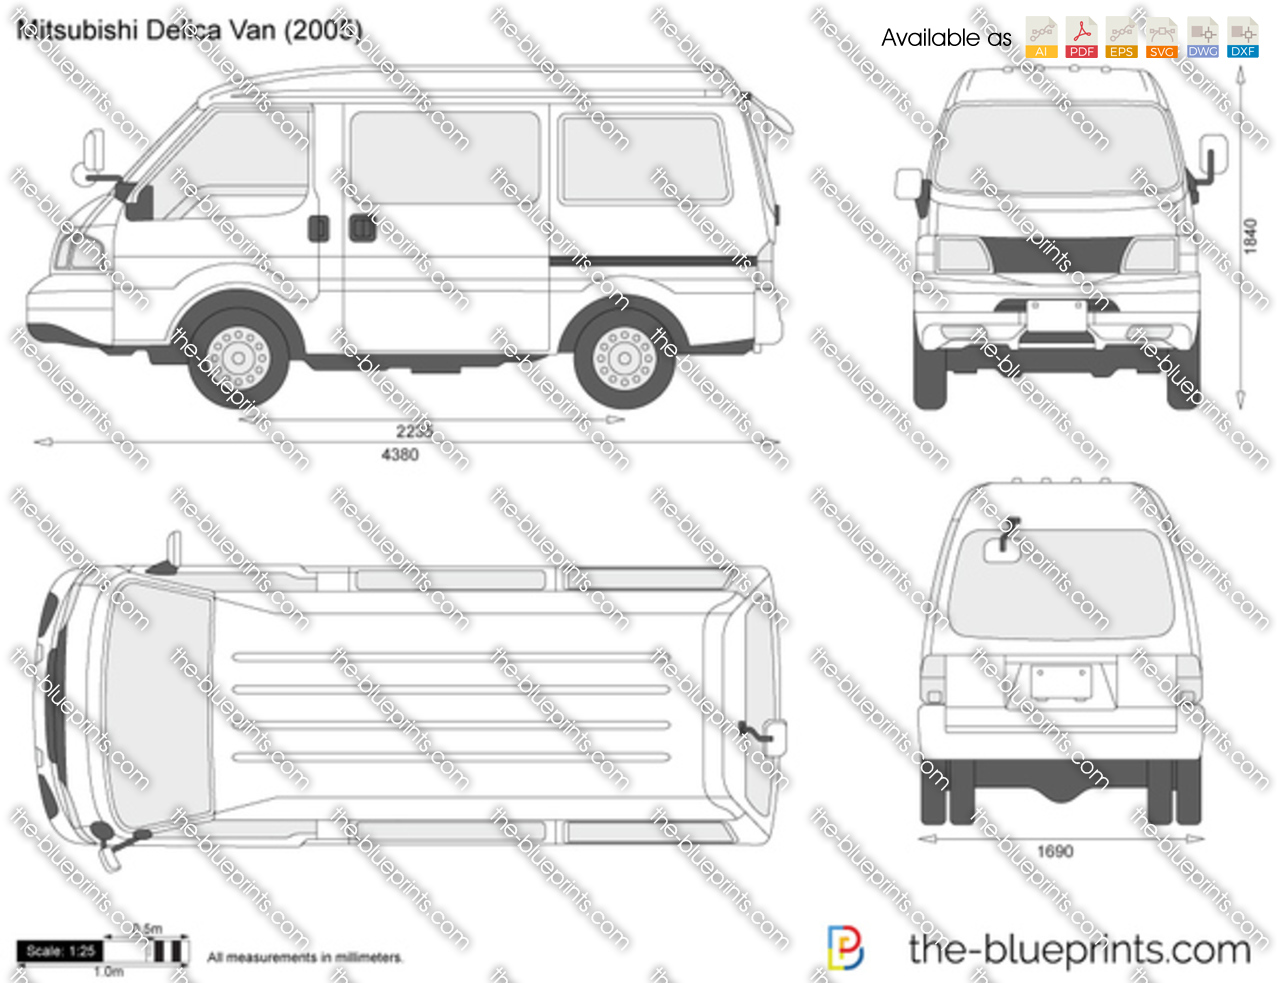 Mitsubishi Delica Van 2014